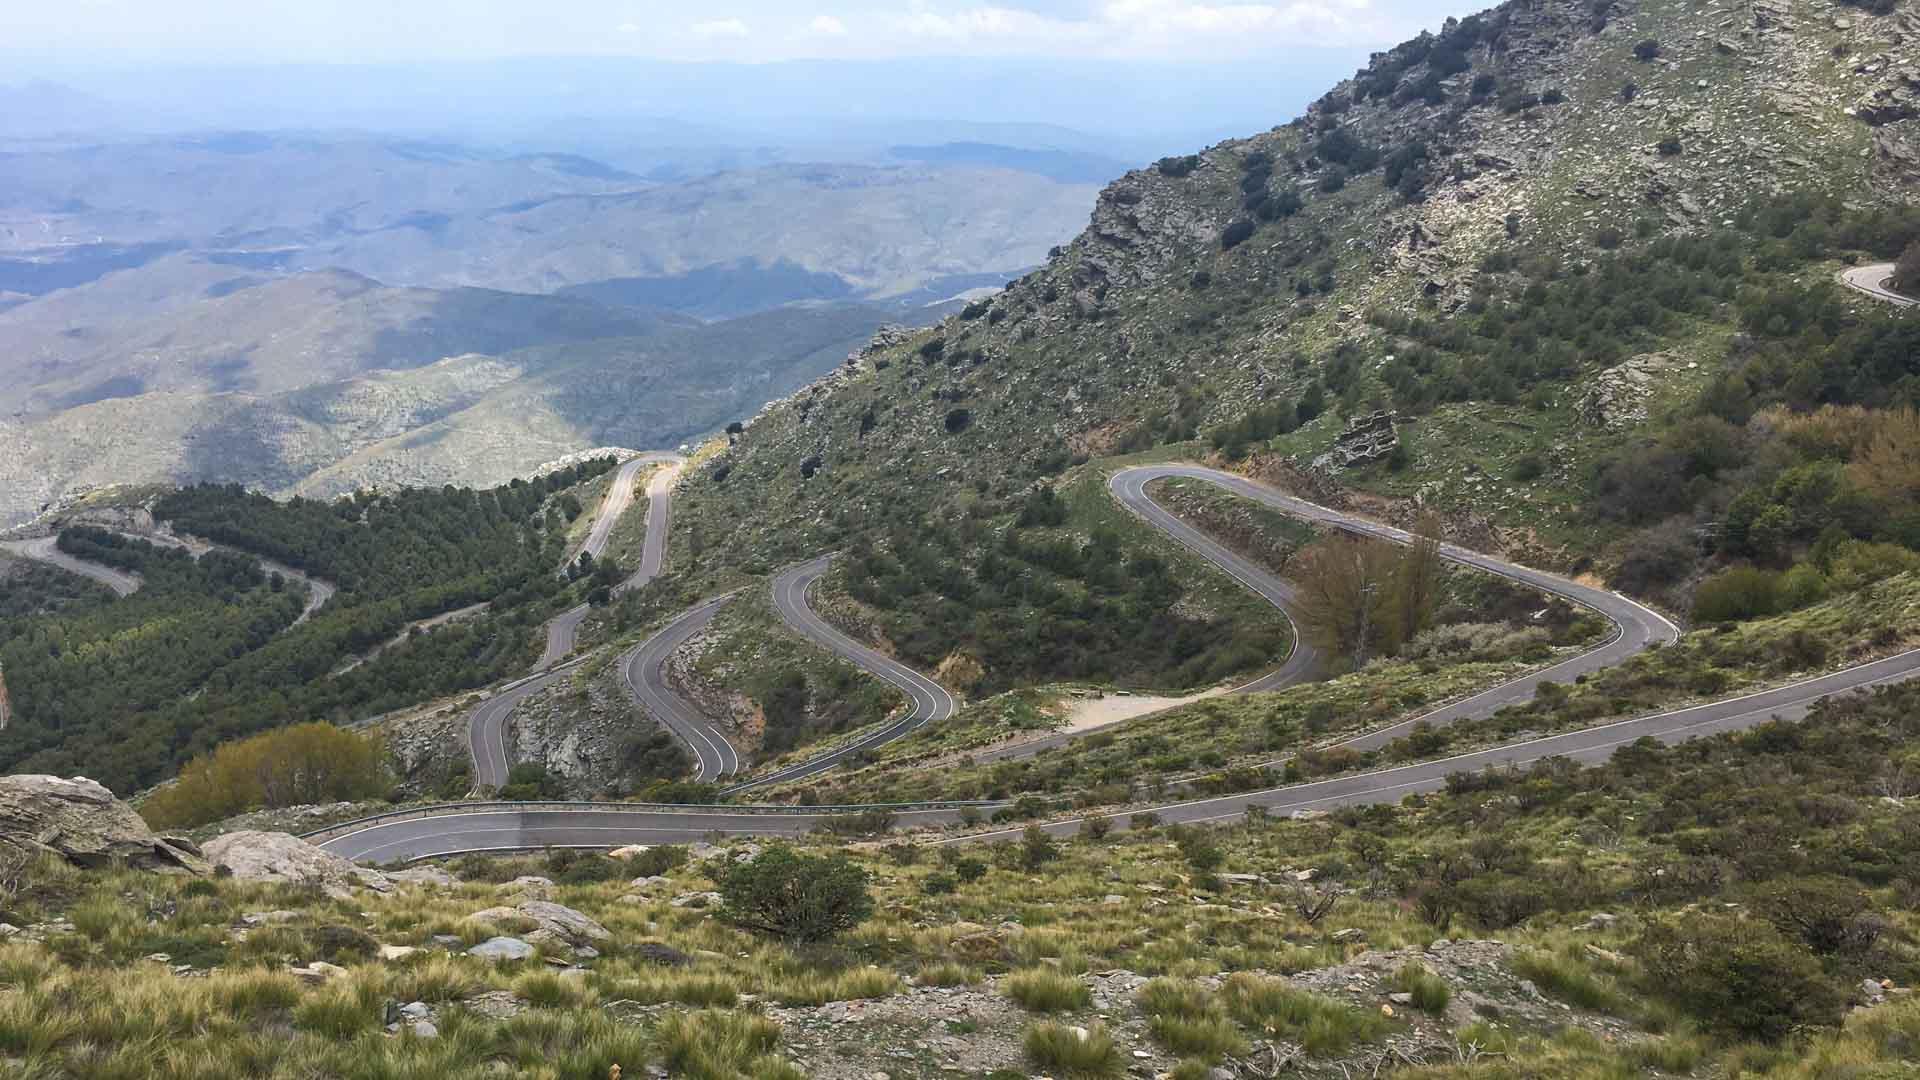 Alto de Velefique, Almeria